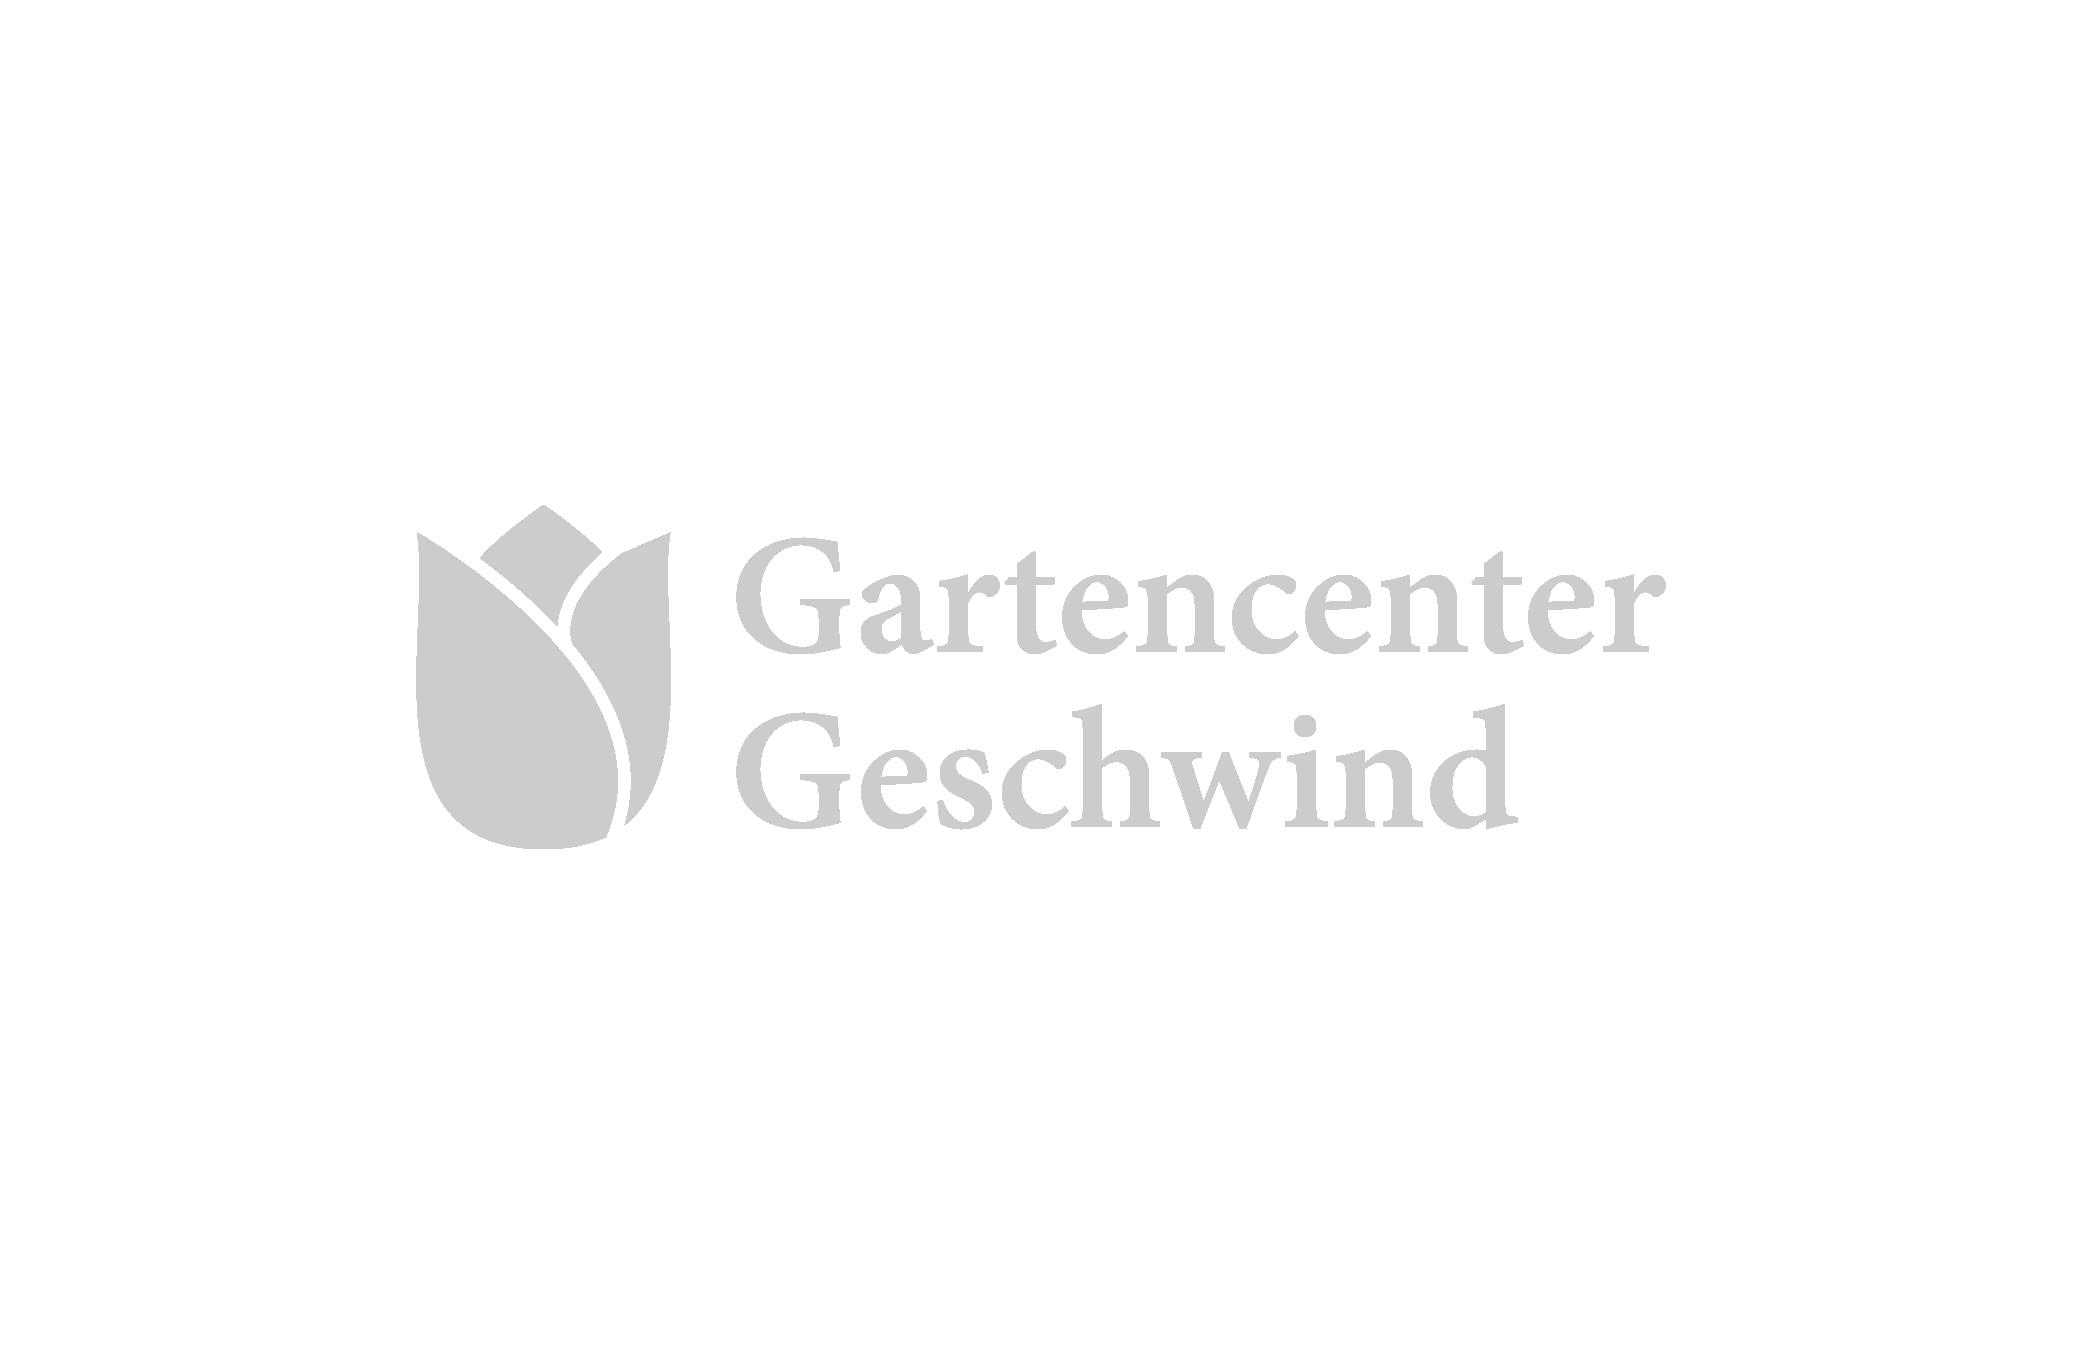 Gartencenter Geschwind